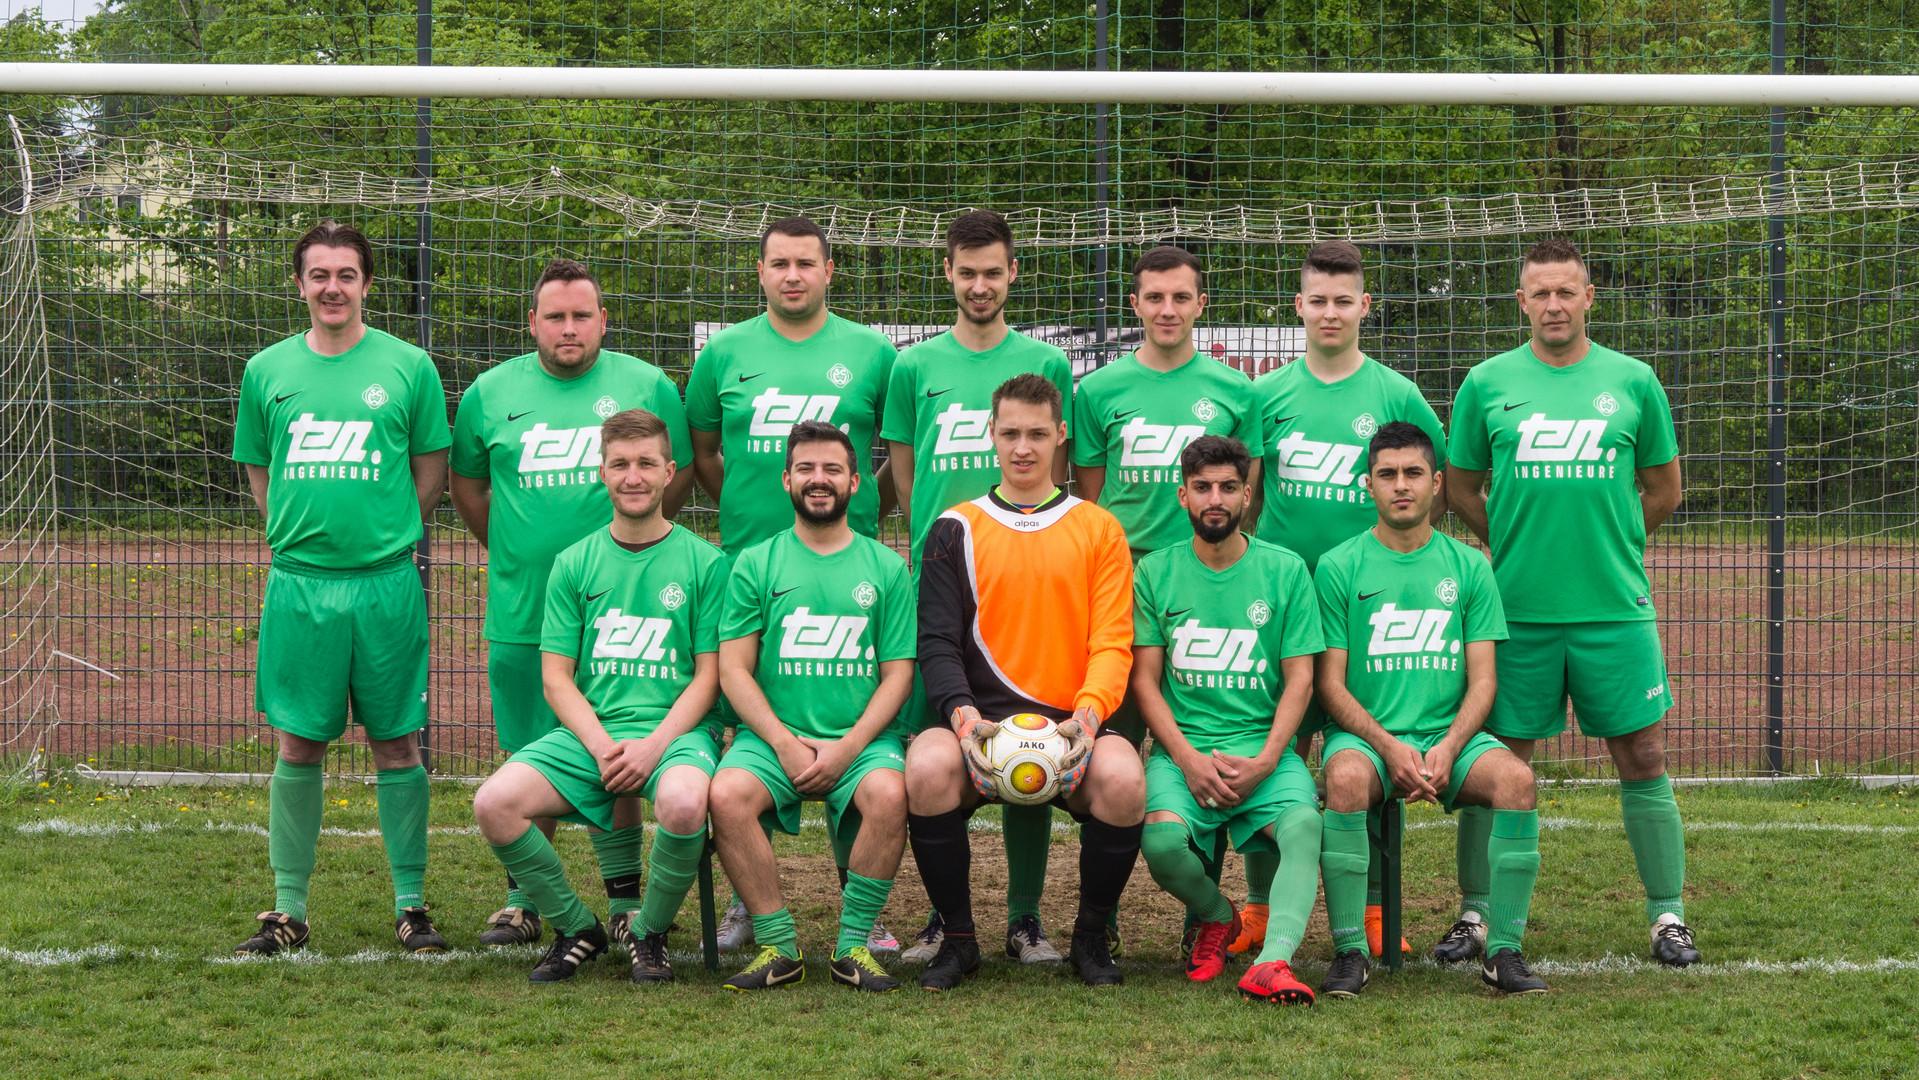 SC Wegberg 2. Mannschaft in neuen Trikots